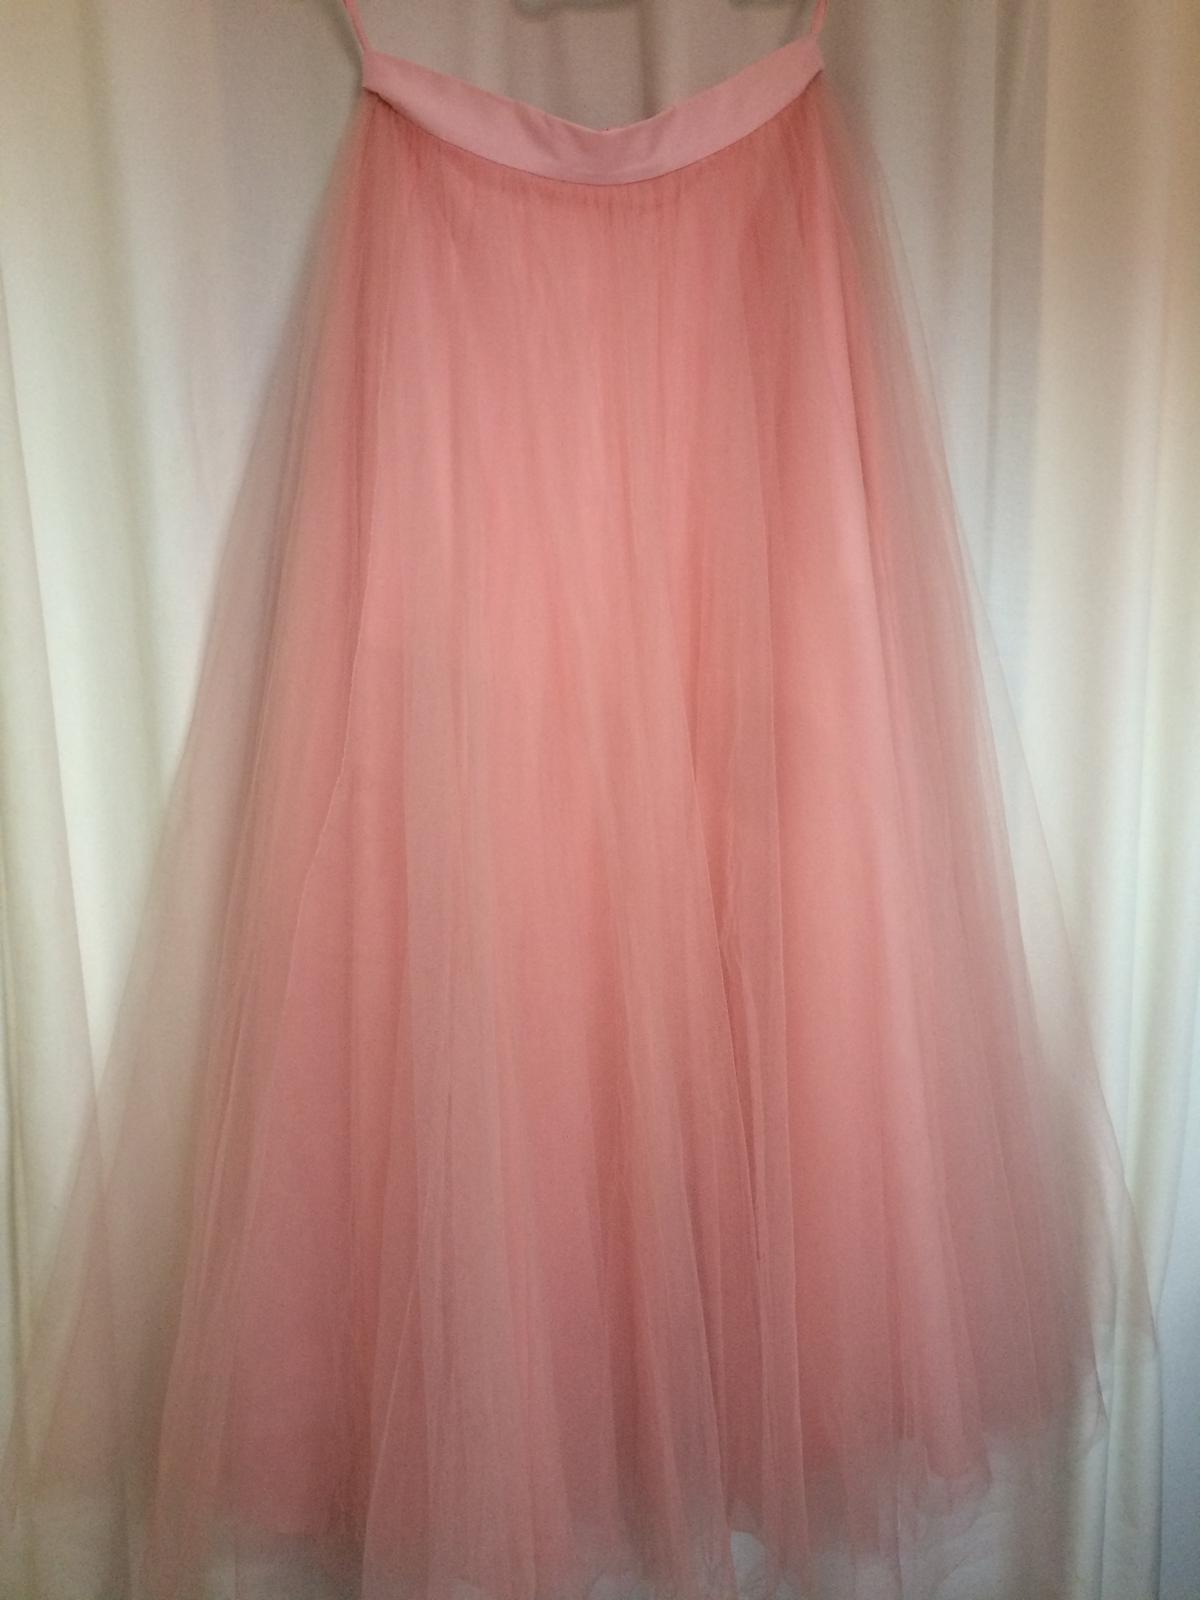 dce505b35a16 Dlhá tylová sukňa